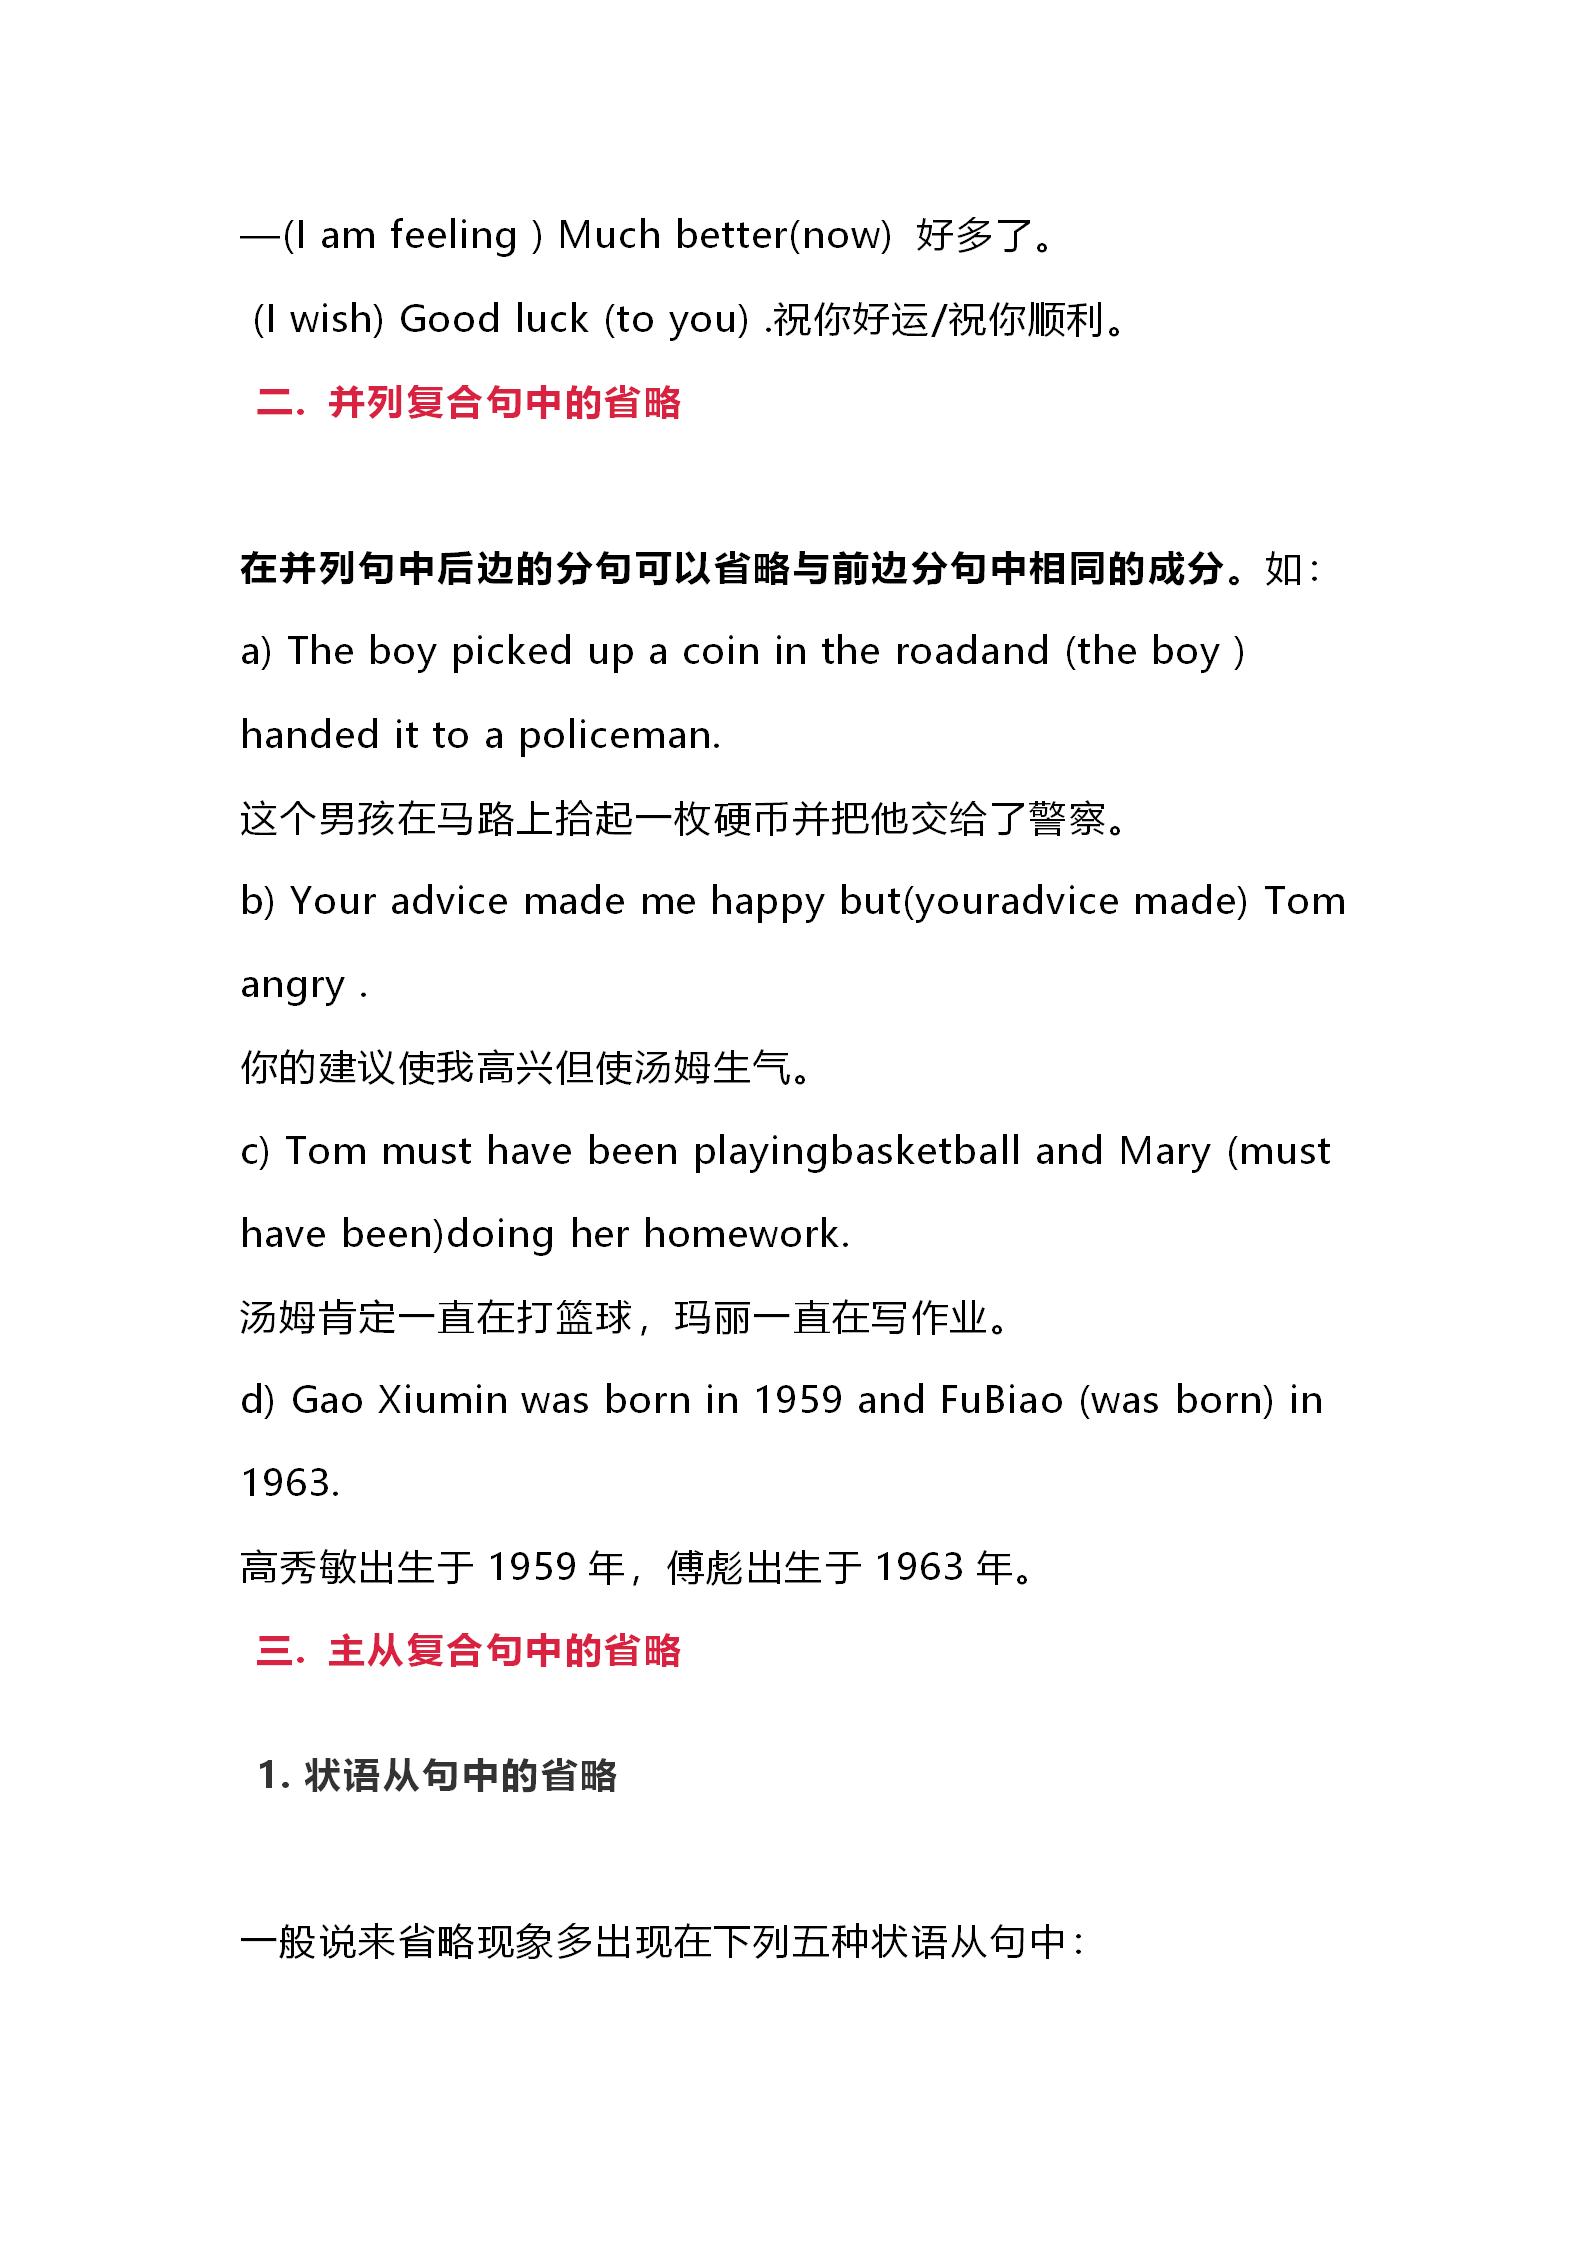 新建 DOCX 文档_02.png